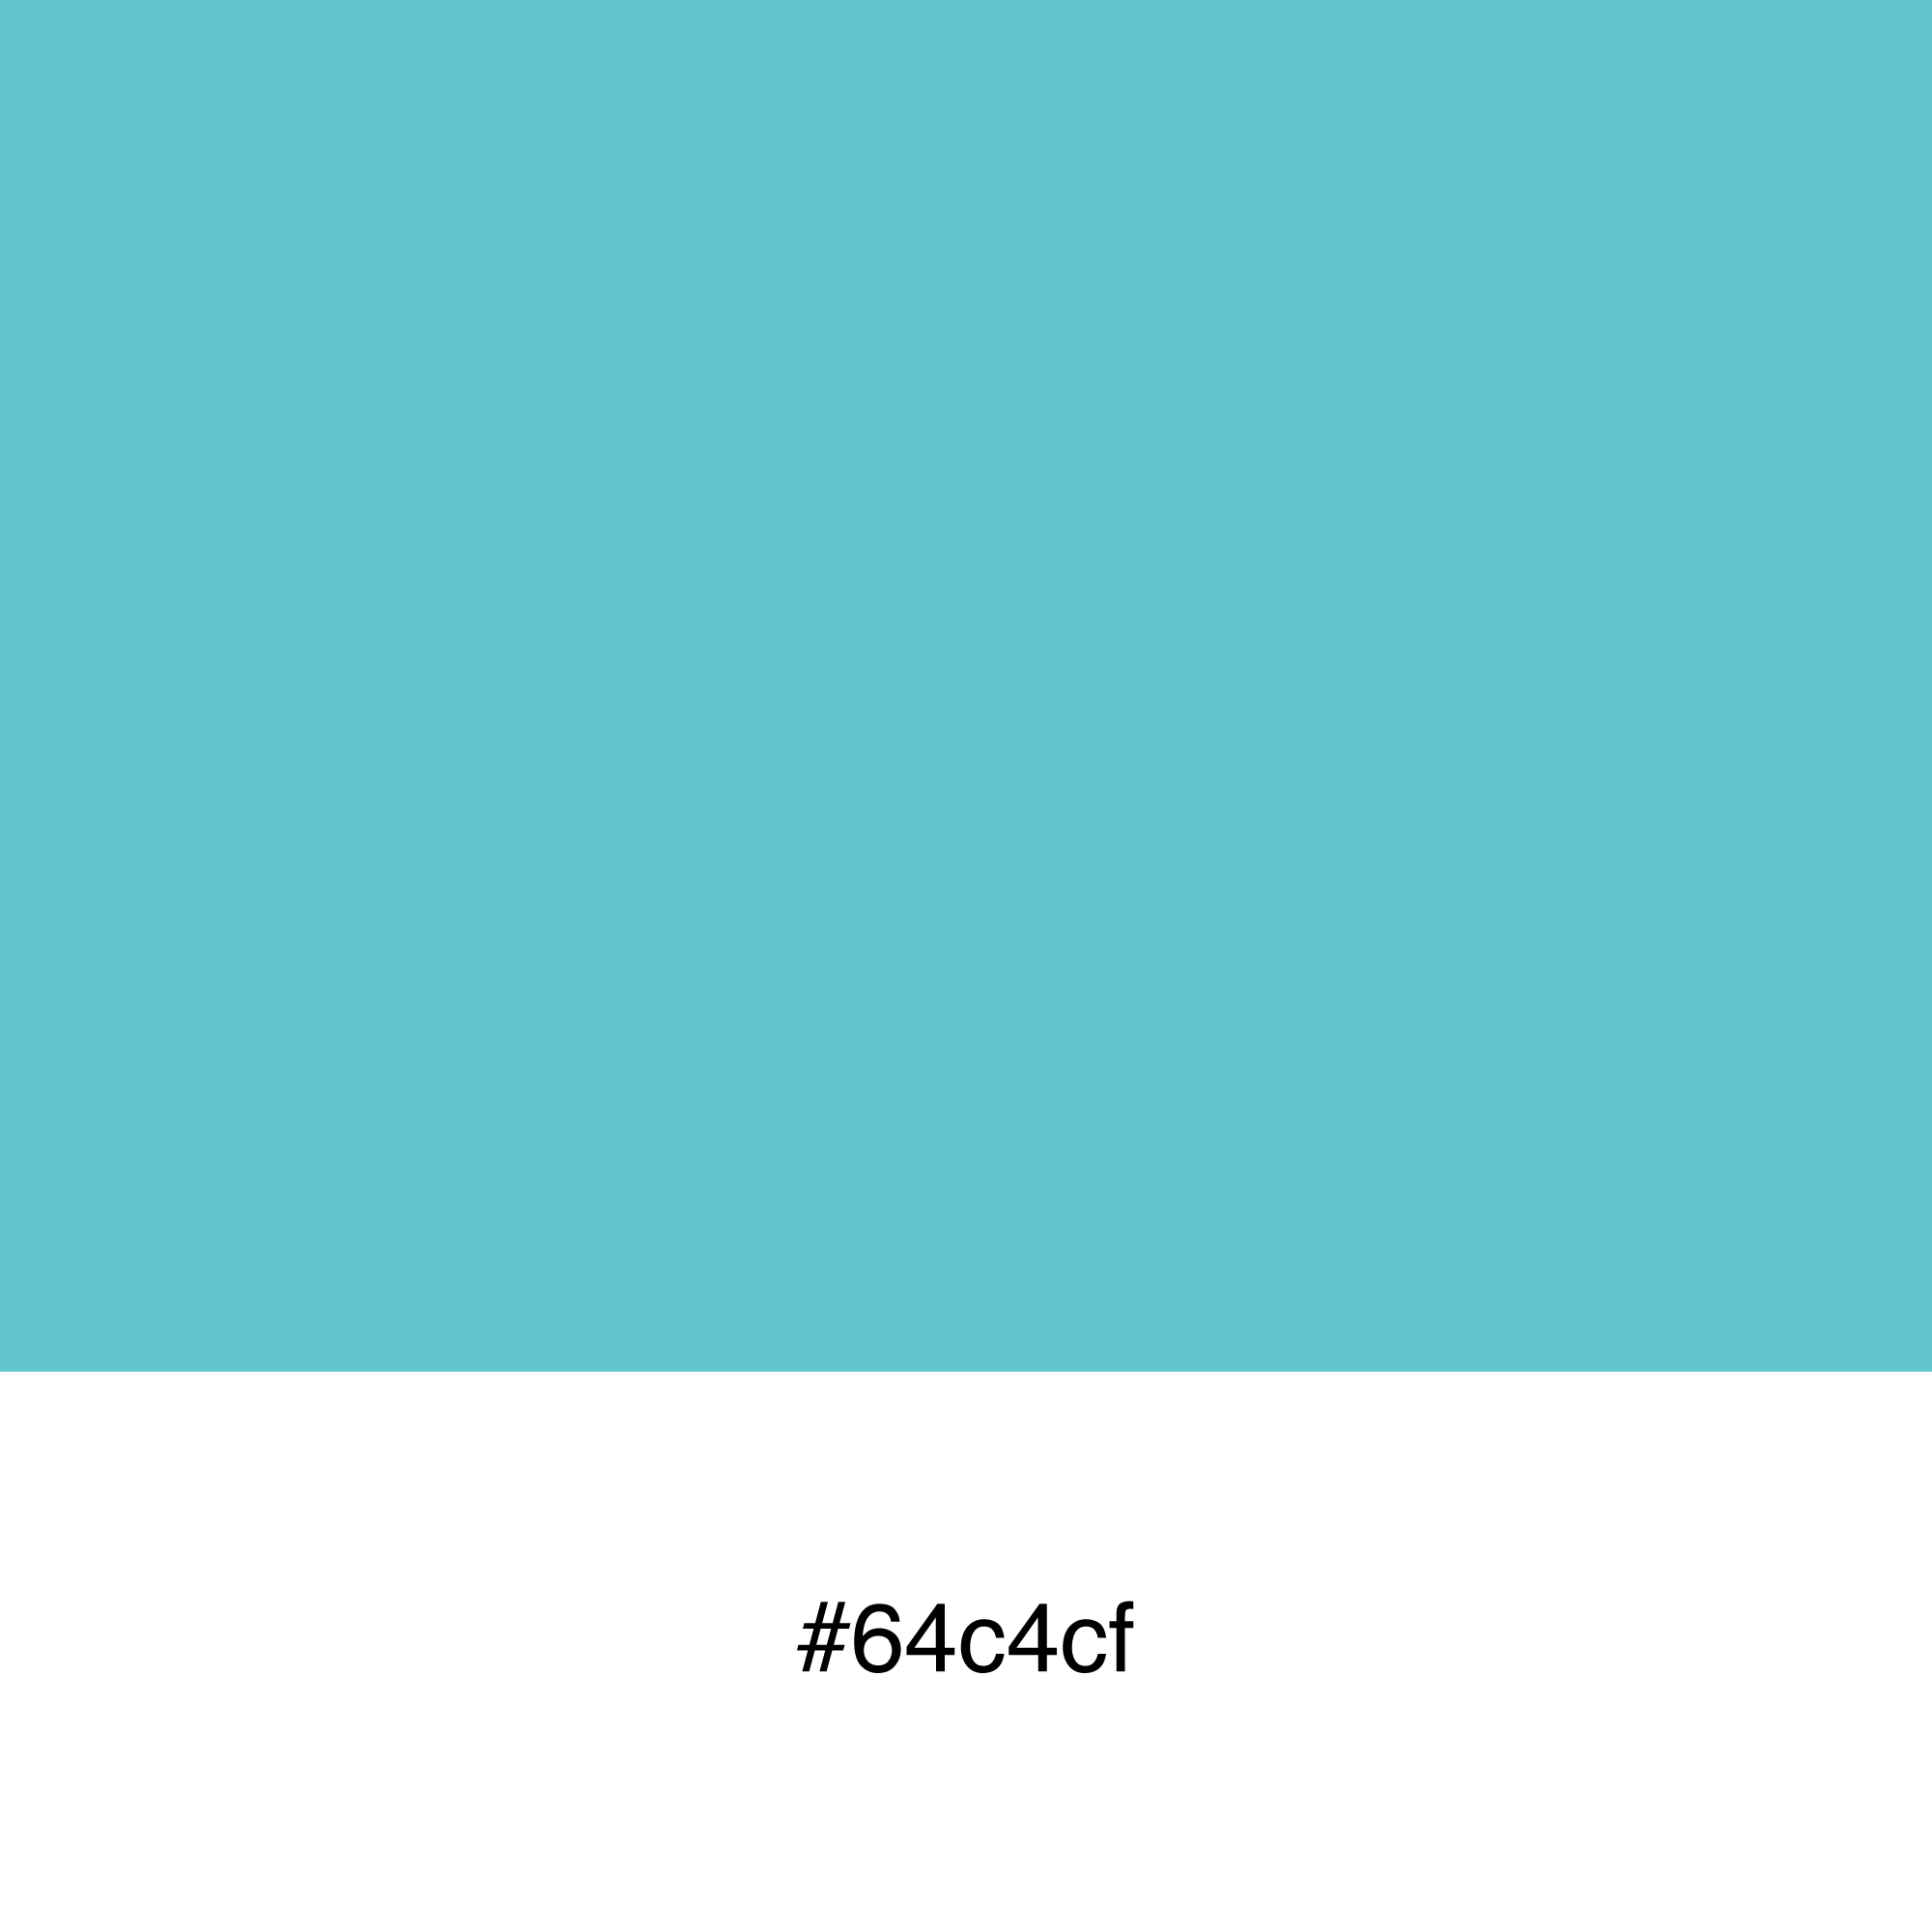 color-swatch-64c4cf